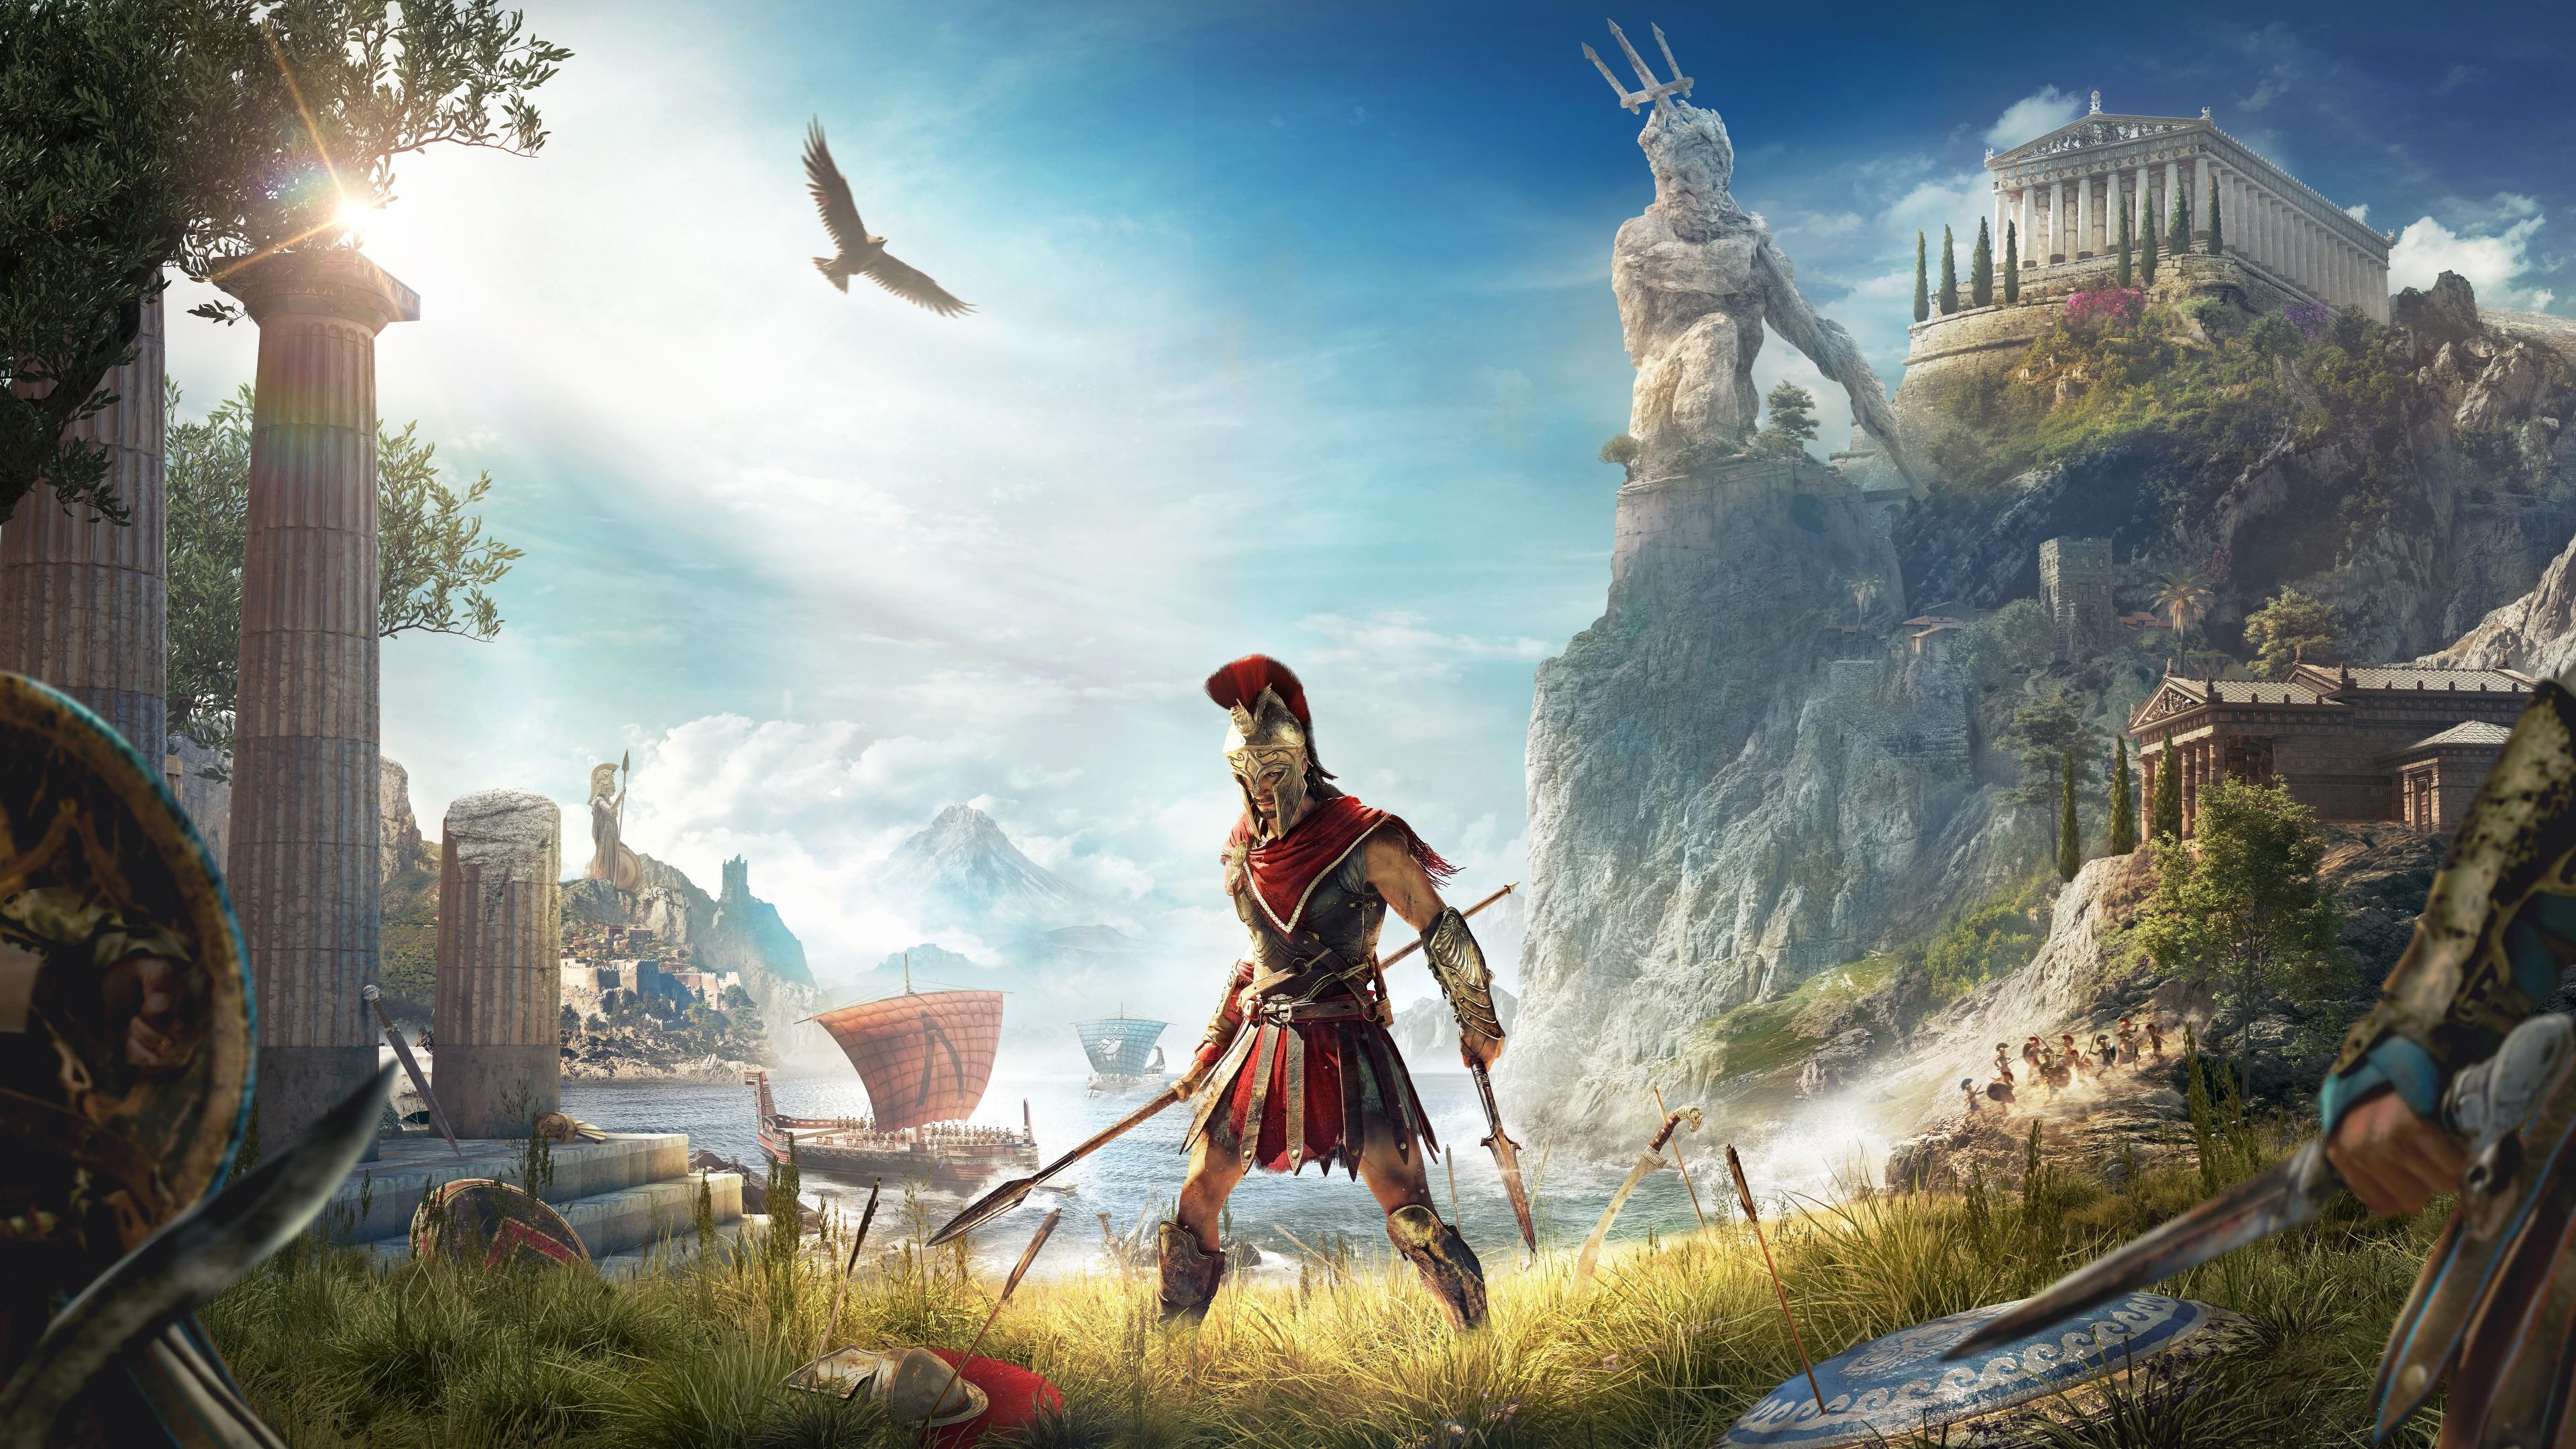 Cute Love Wallpapers Full Hd Assassin S Creed Odyssey 4k 8k Wallpapers Hd Wallpapers